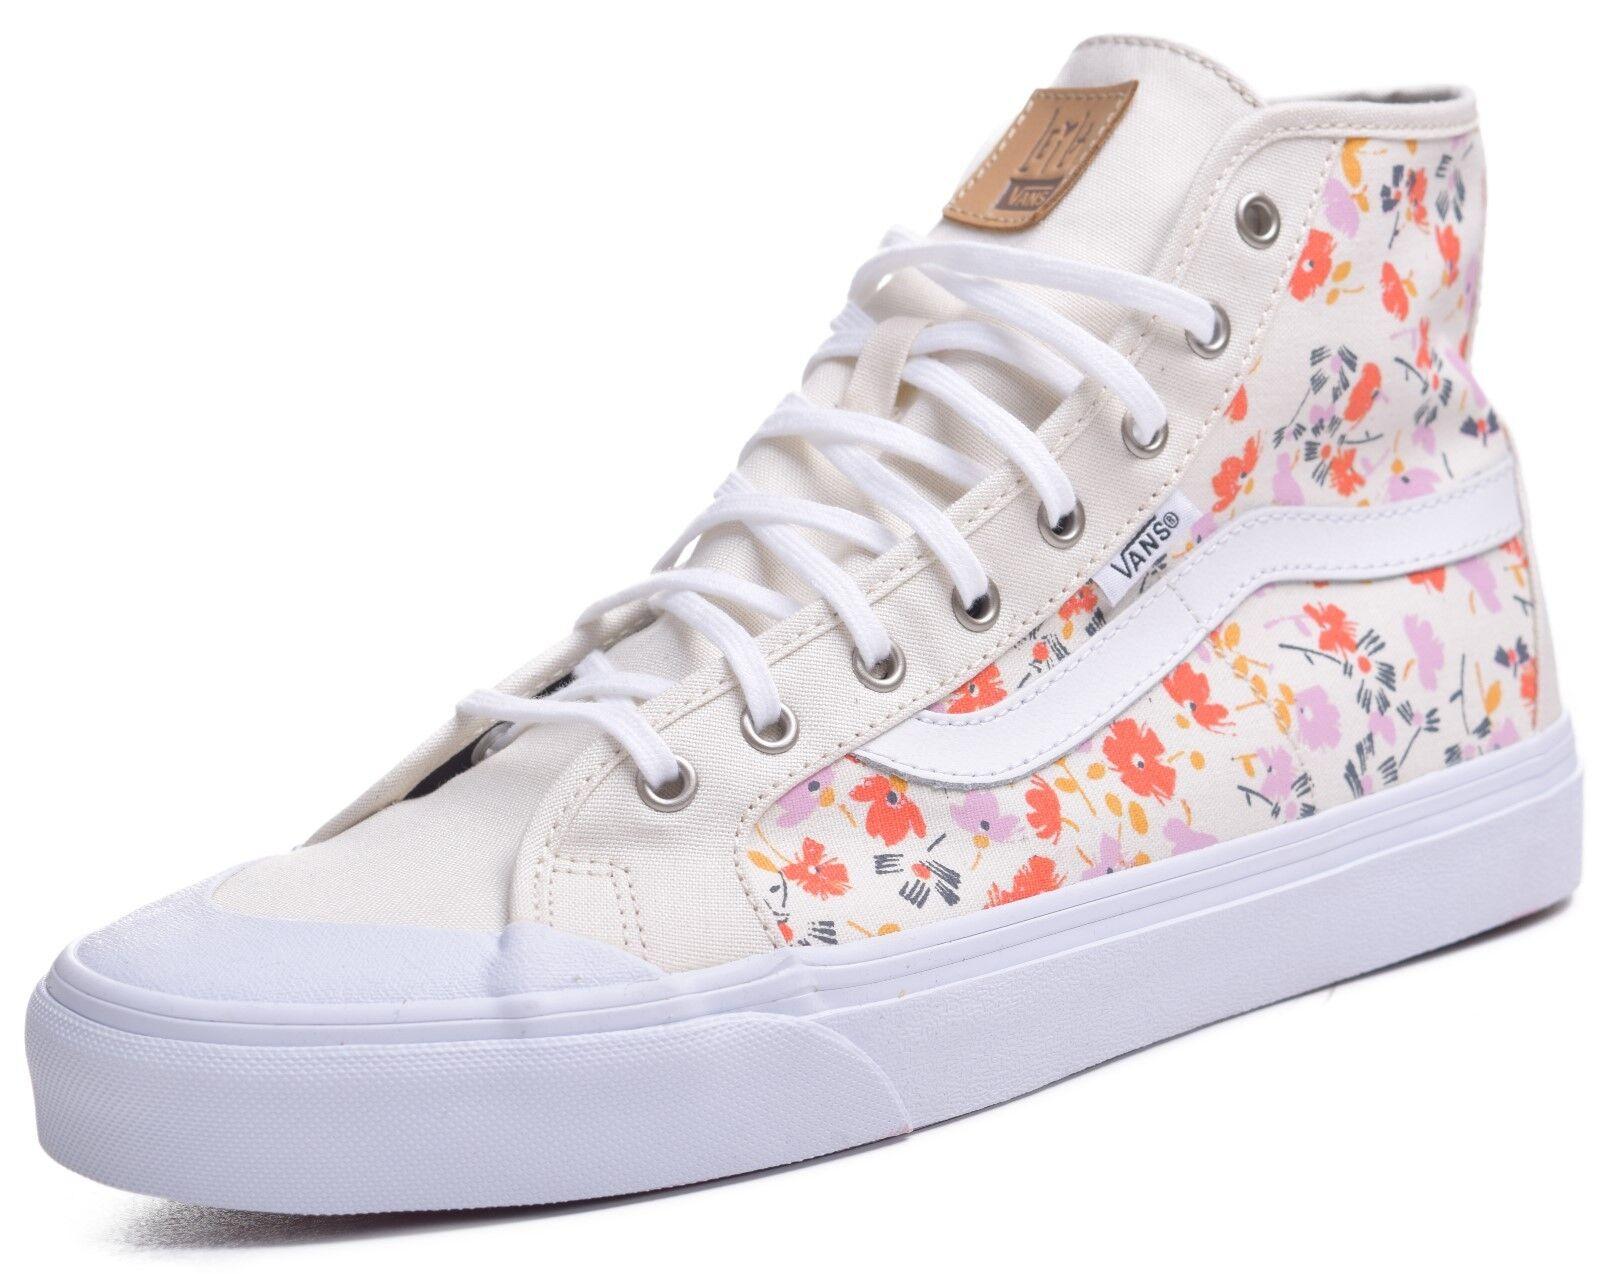 Vans Black Ball Hi Womens Leila Hurst 70's Floral Skateboard Shoes Size 10